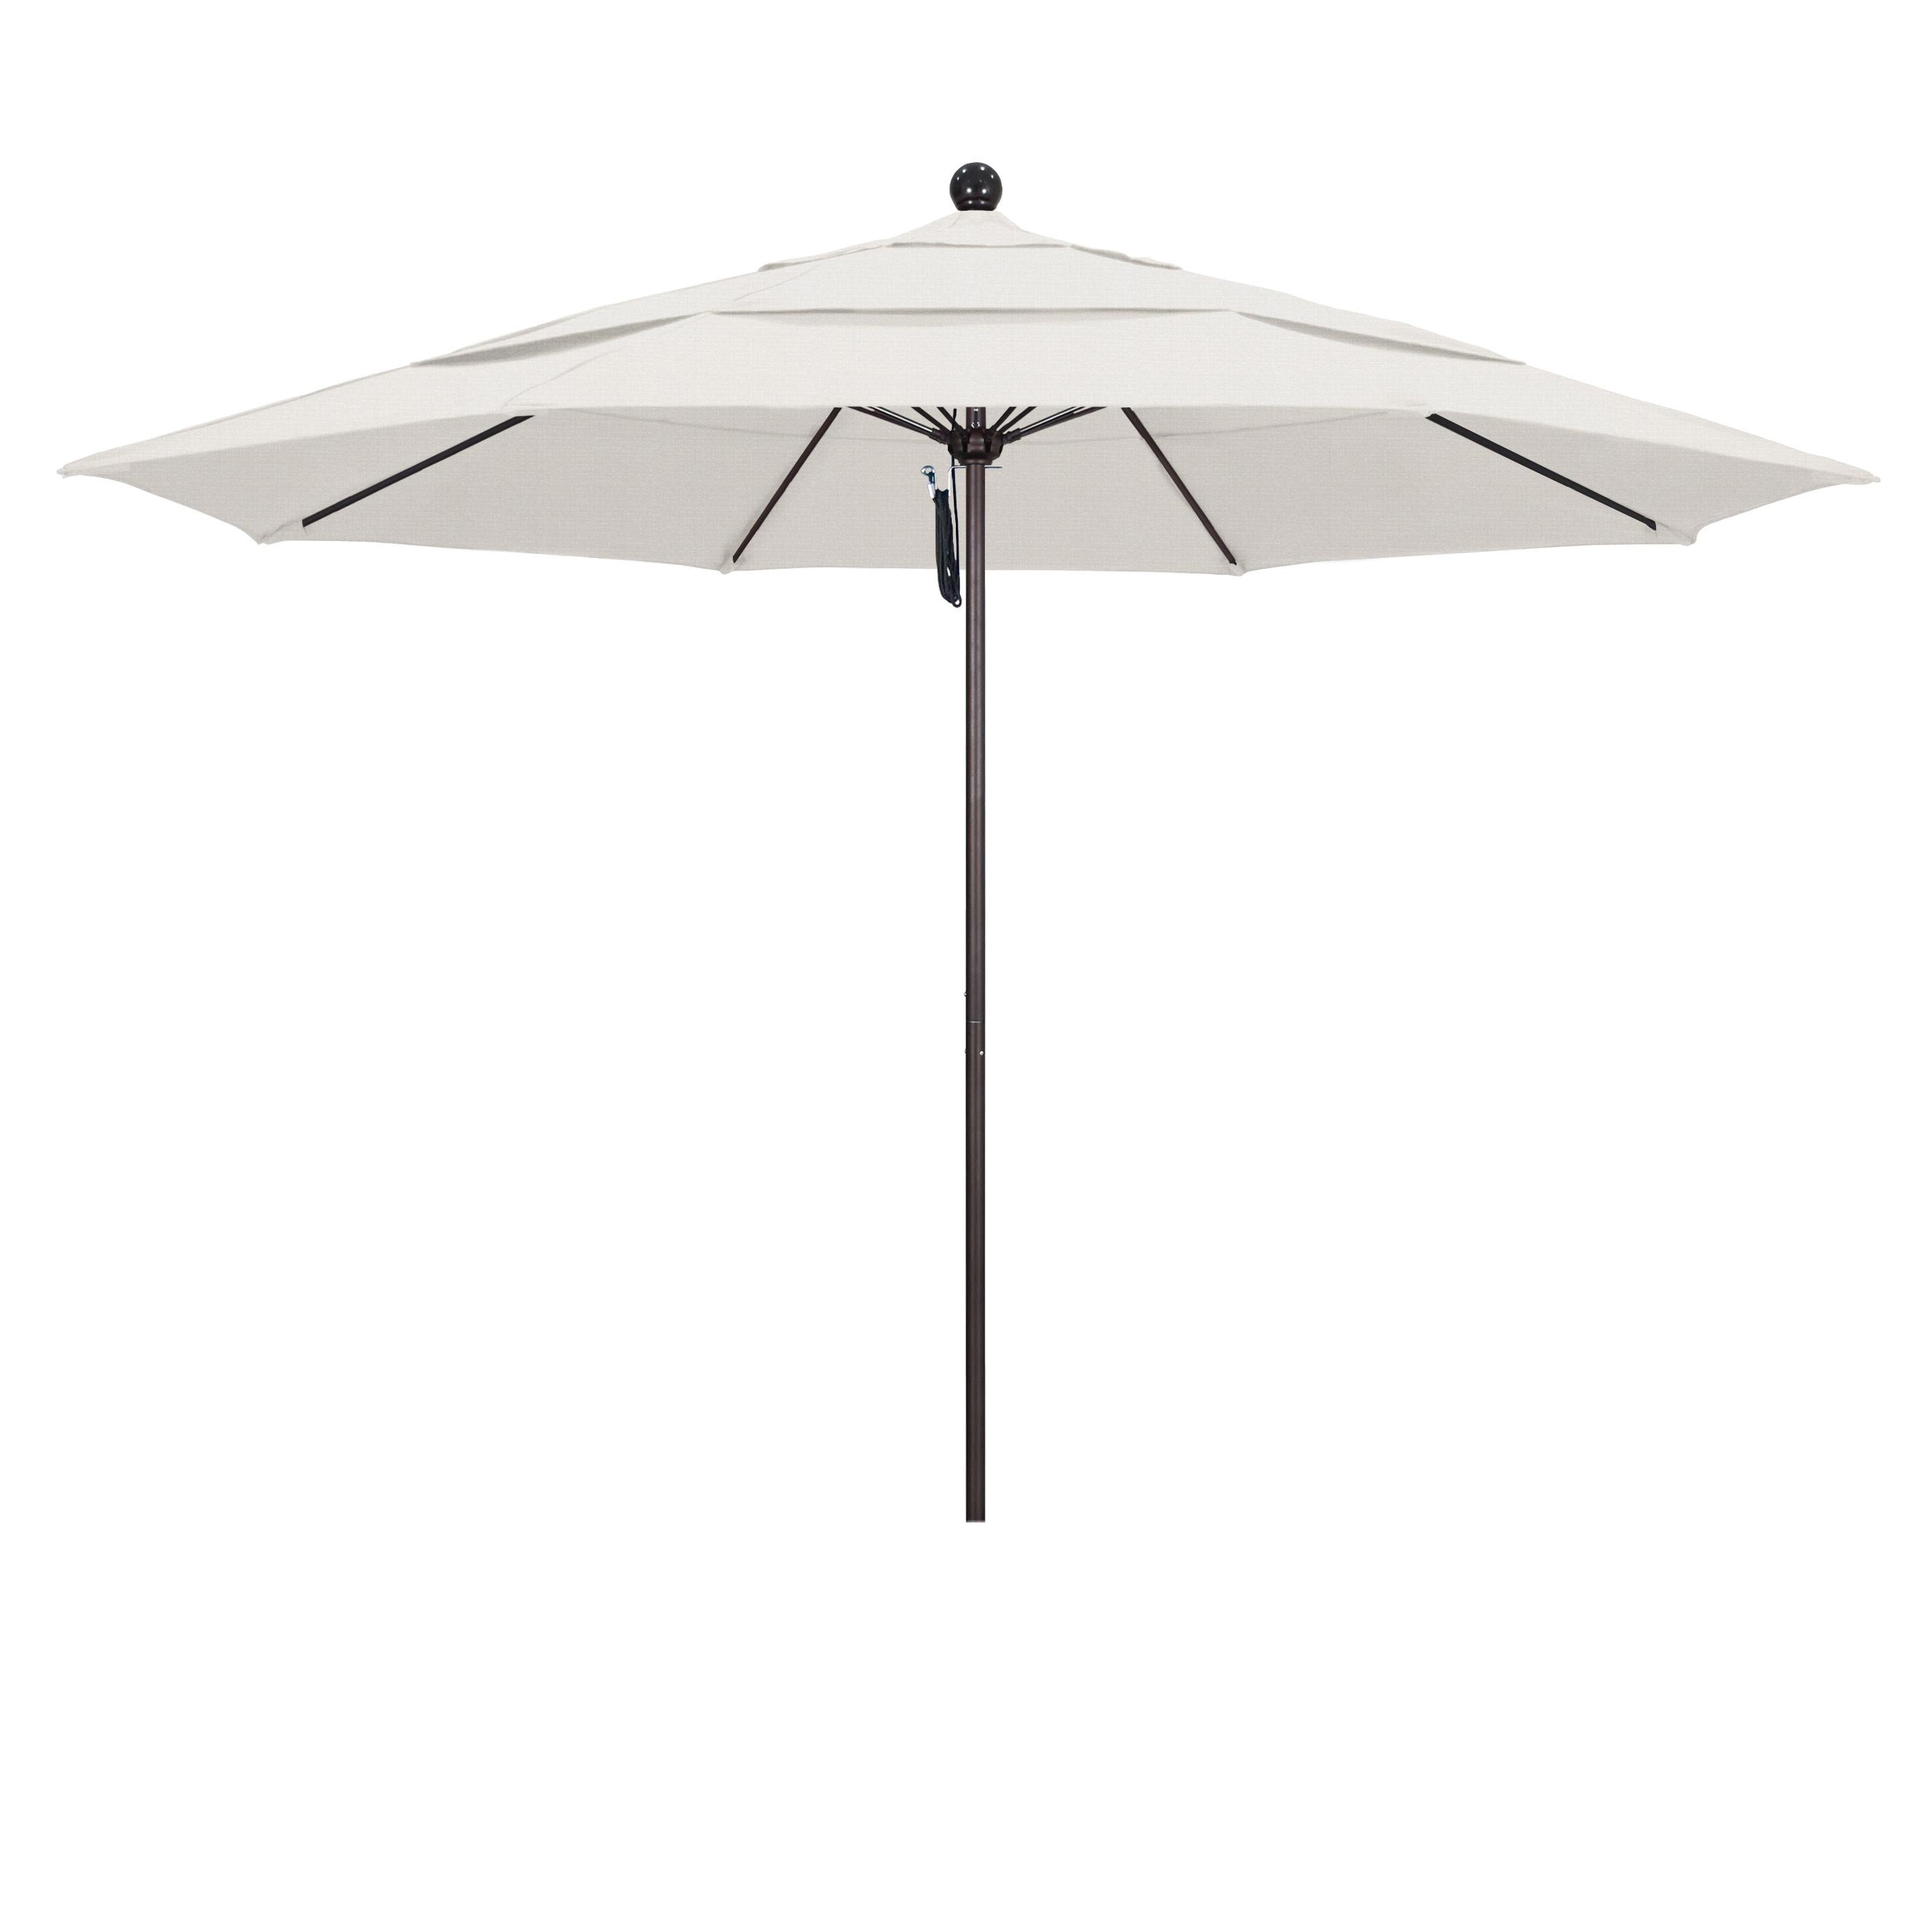 Mullaney Market Umbrellas Throughout Current Davenport 11' Market Umbrella (View 12 of 20)